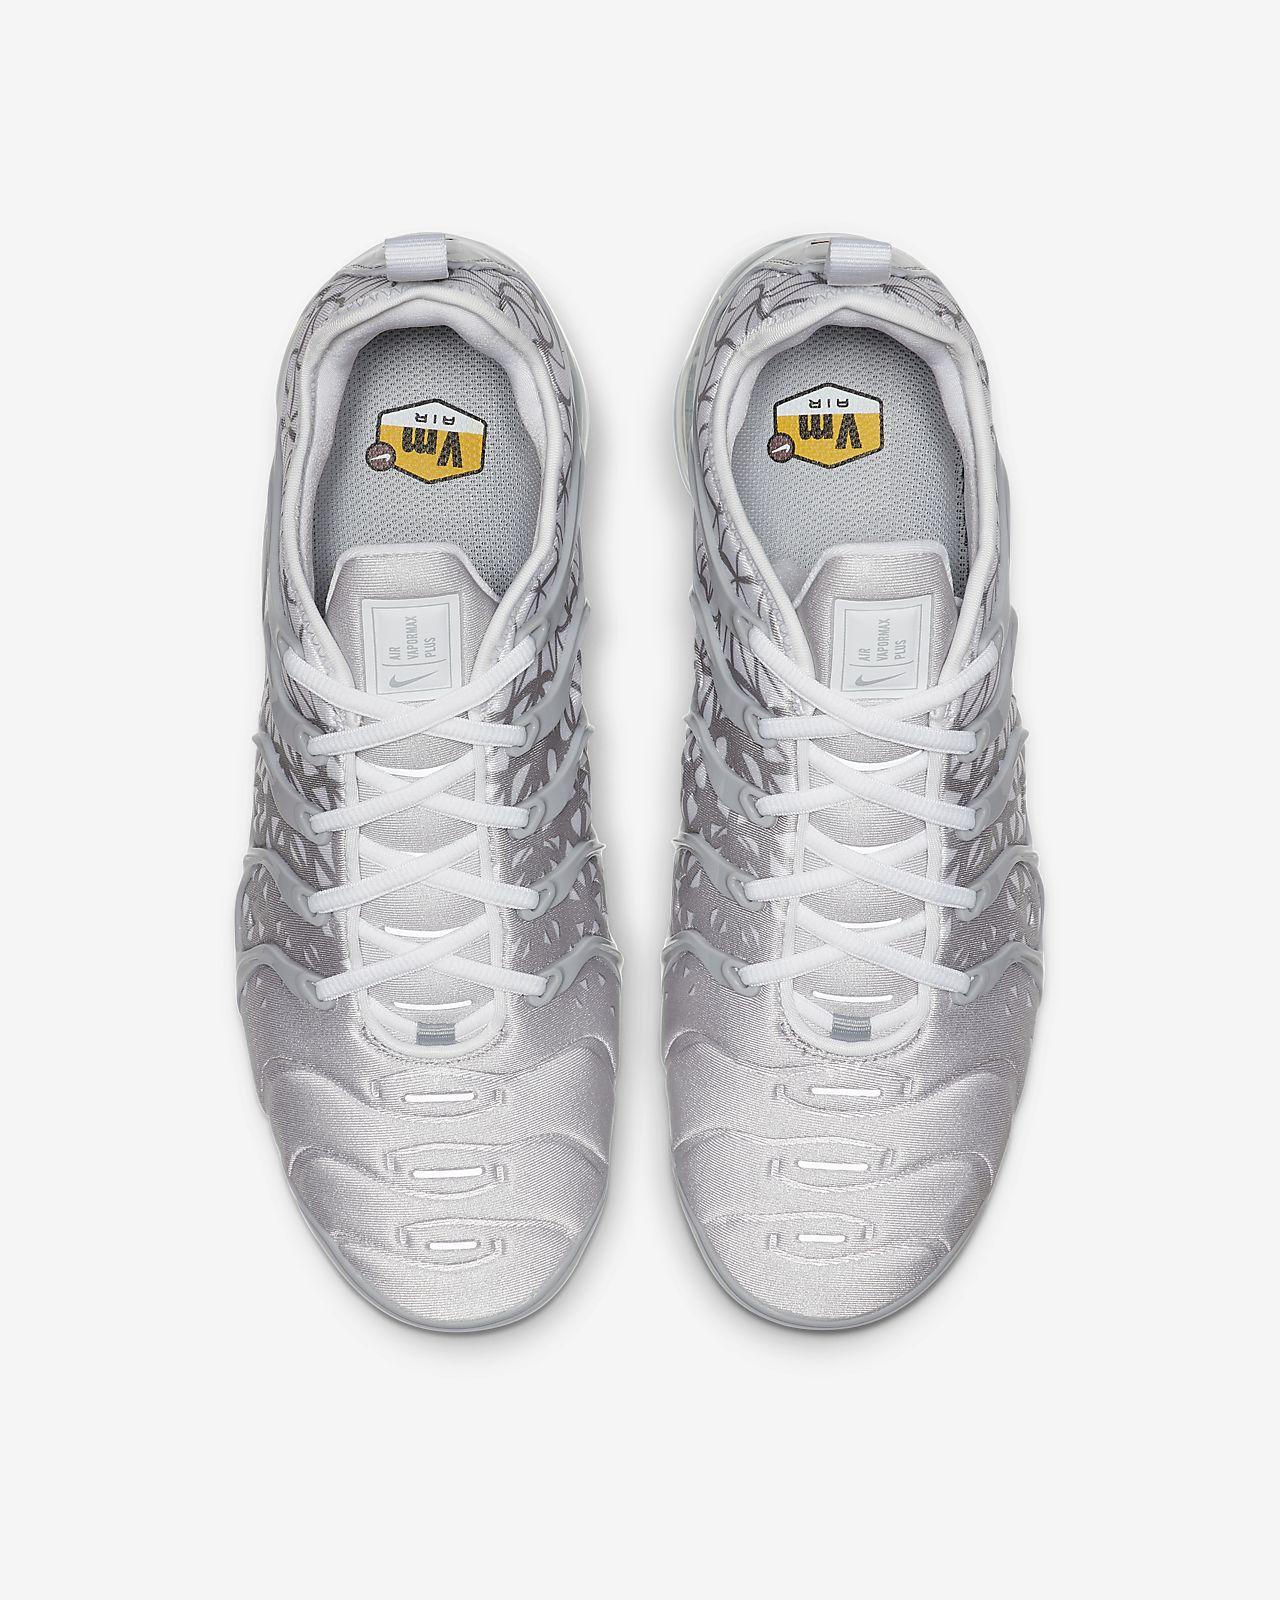 huge discount 8ad15 12de1 ... Scarpa Nike Air VaporMax Plus - Uomo